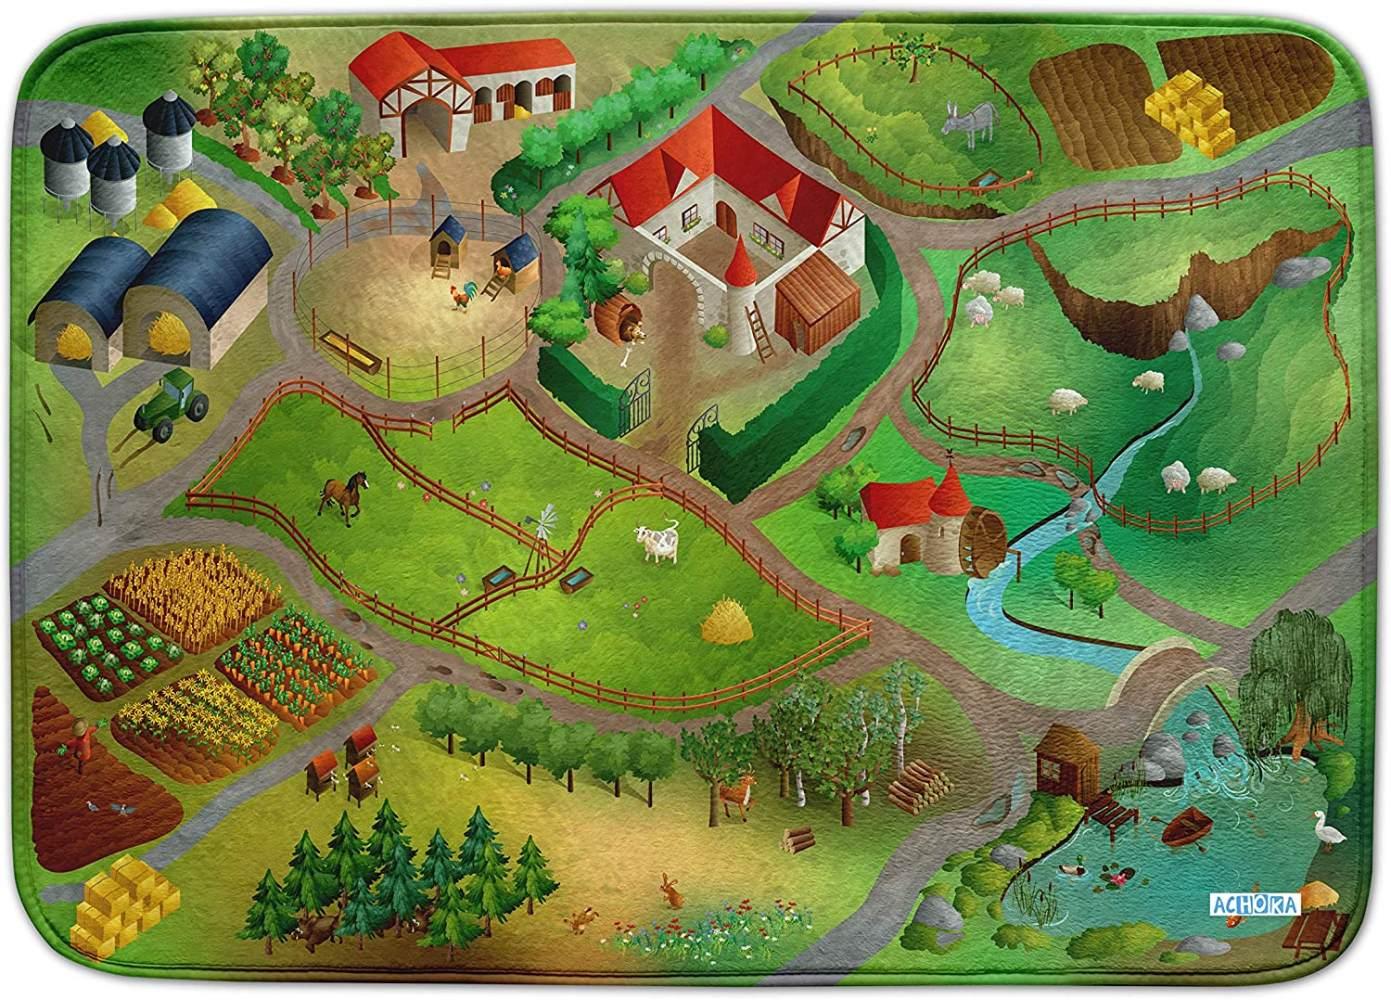 Spielteppich Farm uns Connect 100 x 150 cm Bild 1